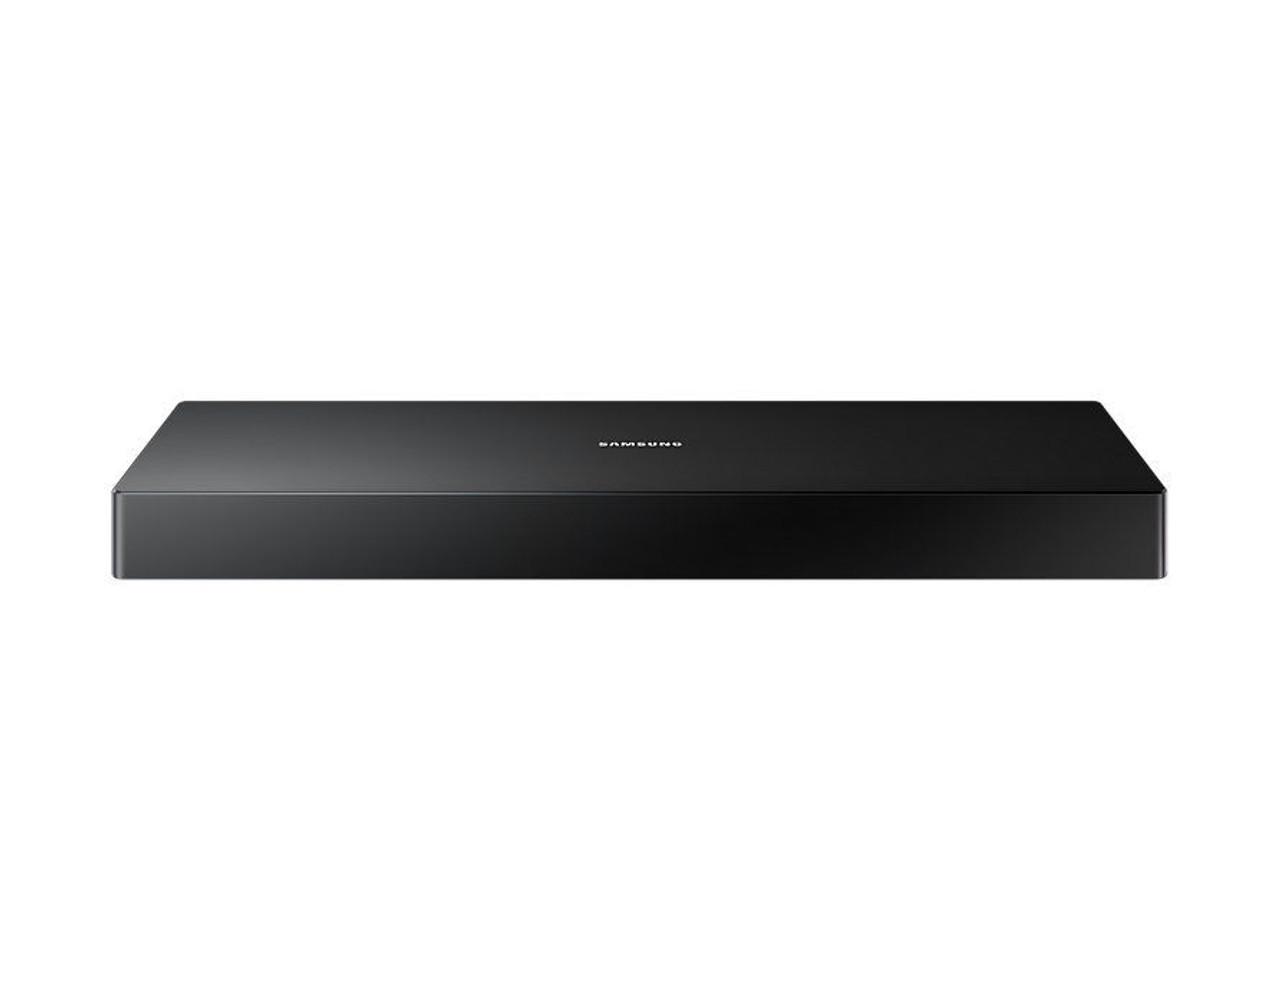 Samsung SEK4500 2018 Evolution Kit for Samsung TVs - HURRY LAST 5!